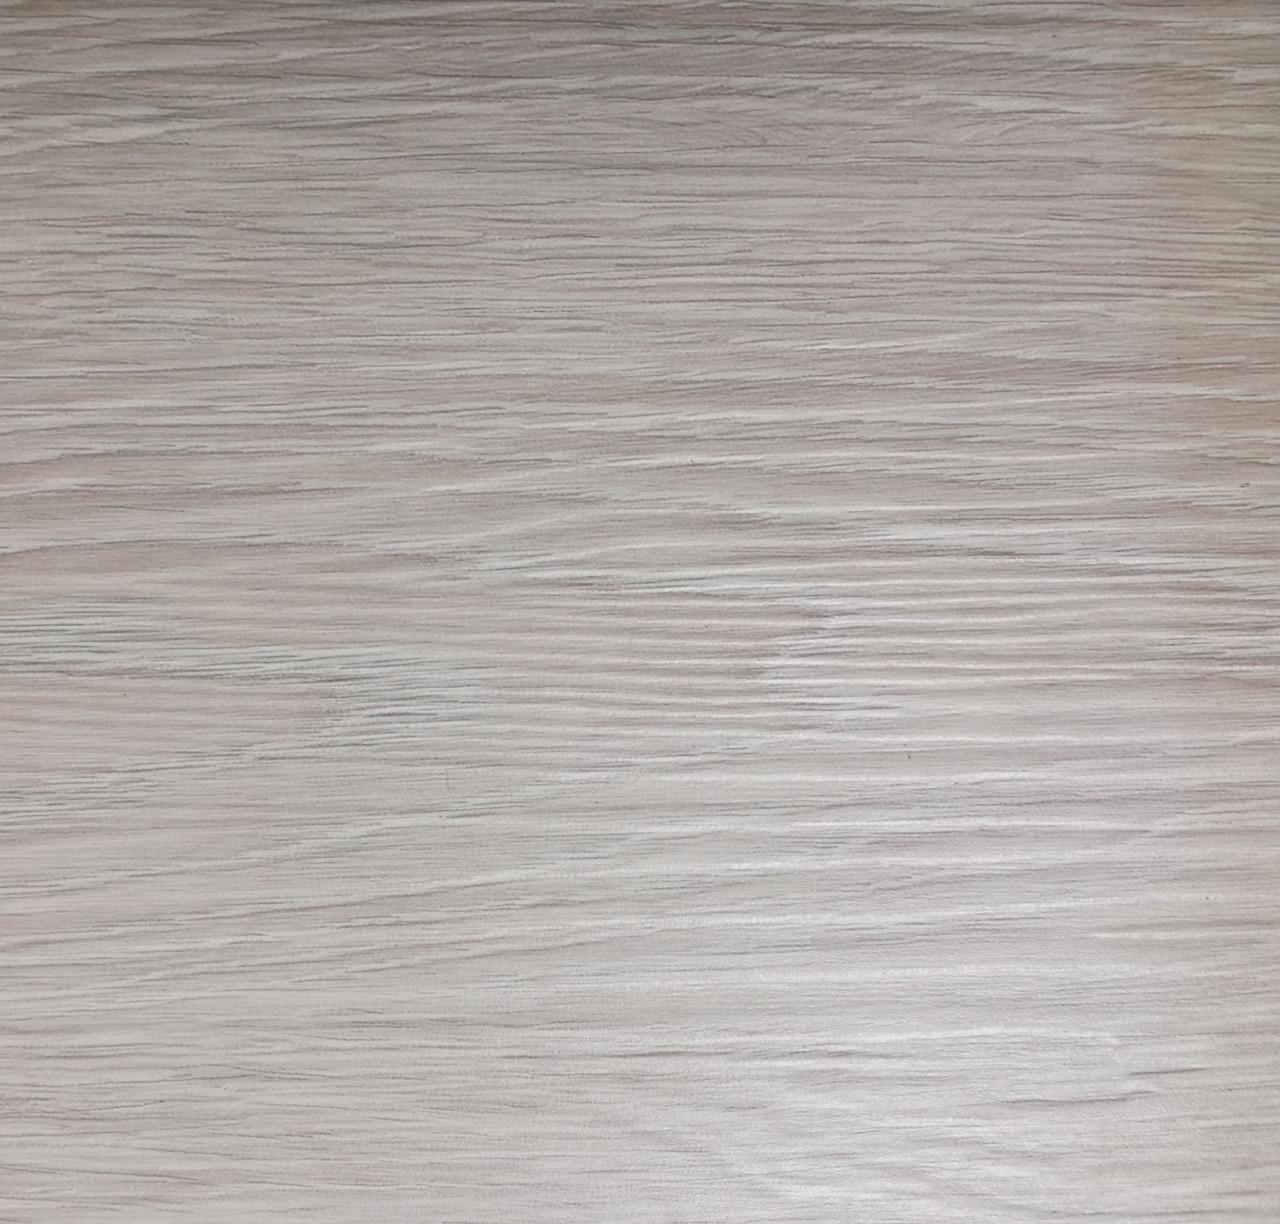 Плитка ПВХ Moon Tile СМ03